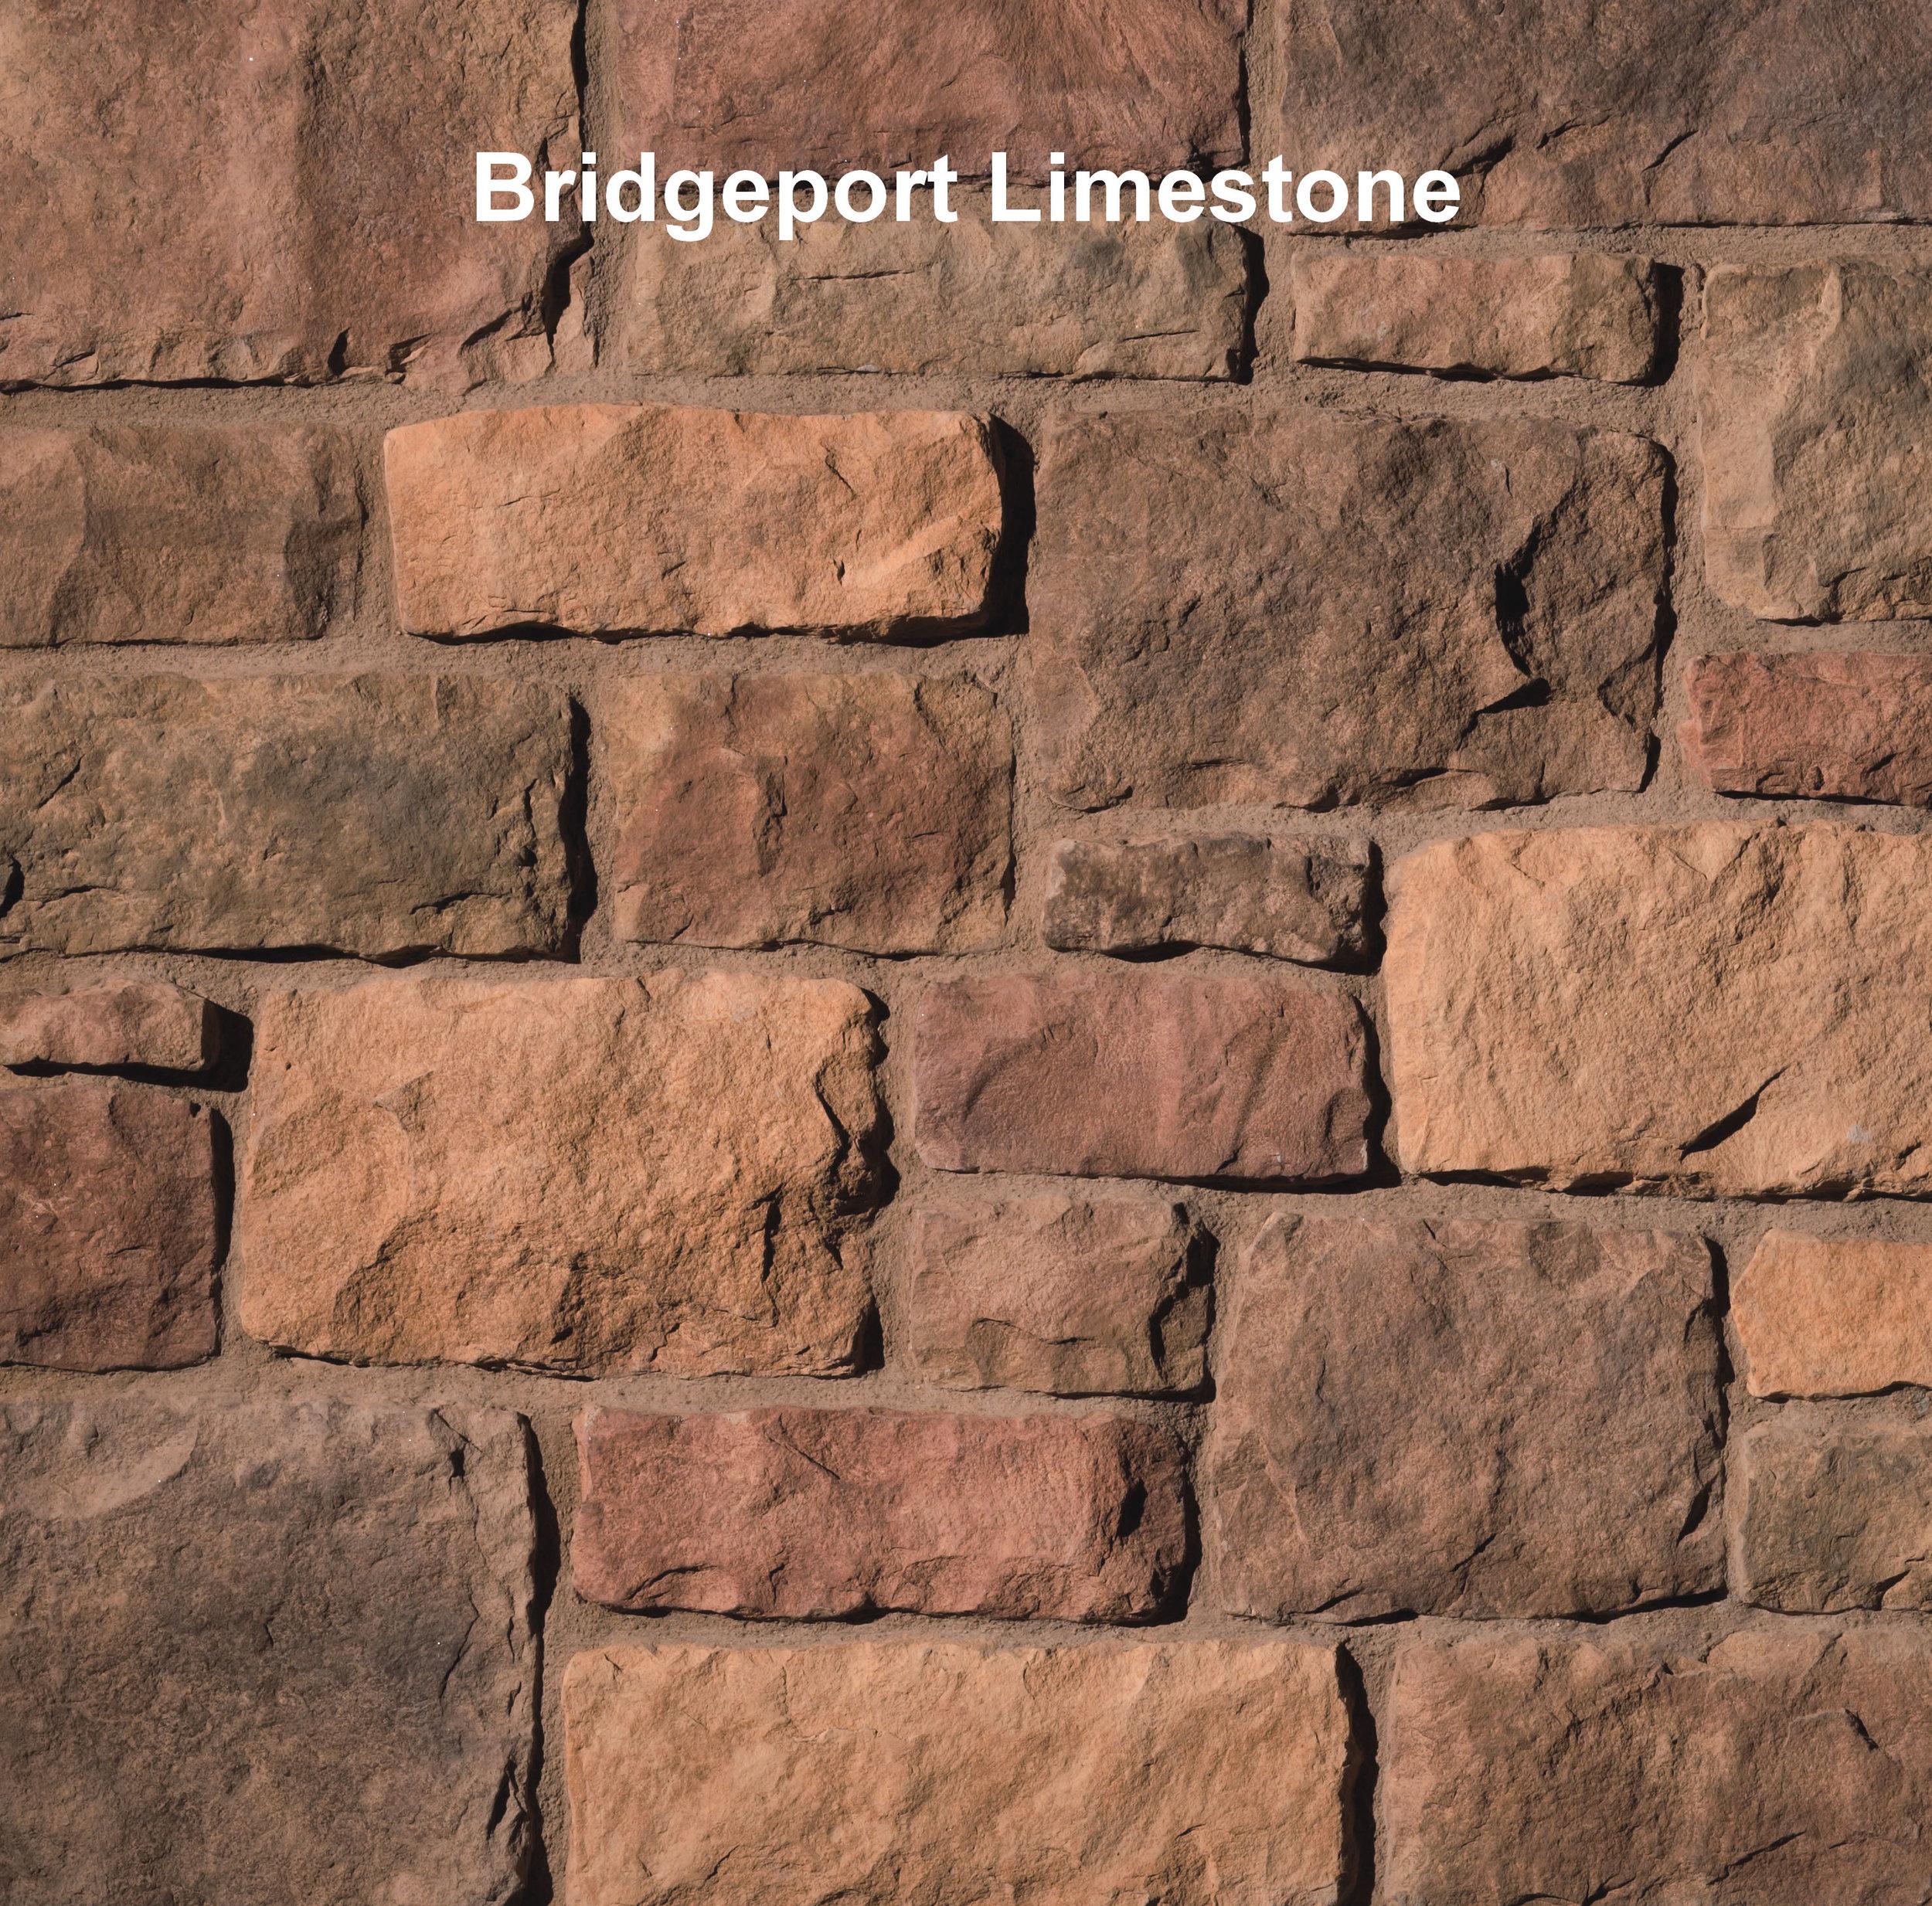 ES_Limestone_Bridgeport_profile_east.jpg